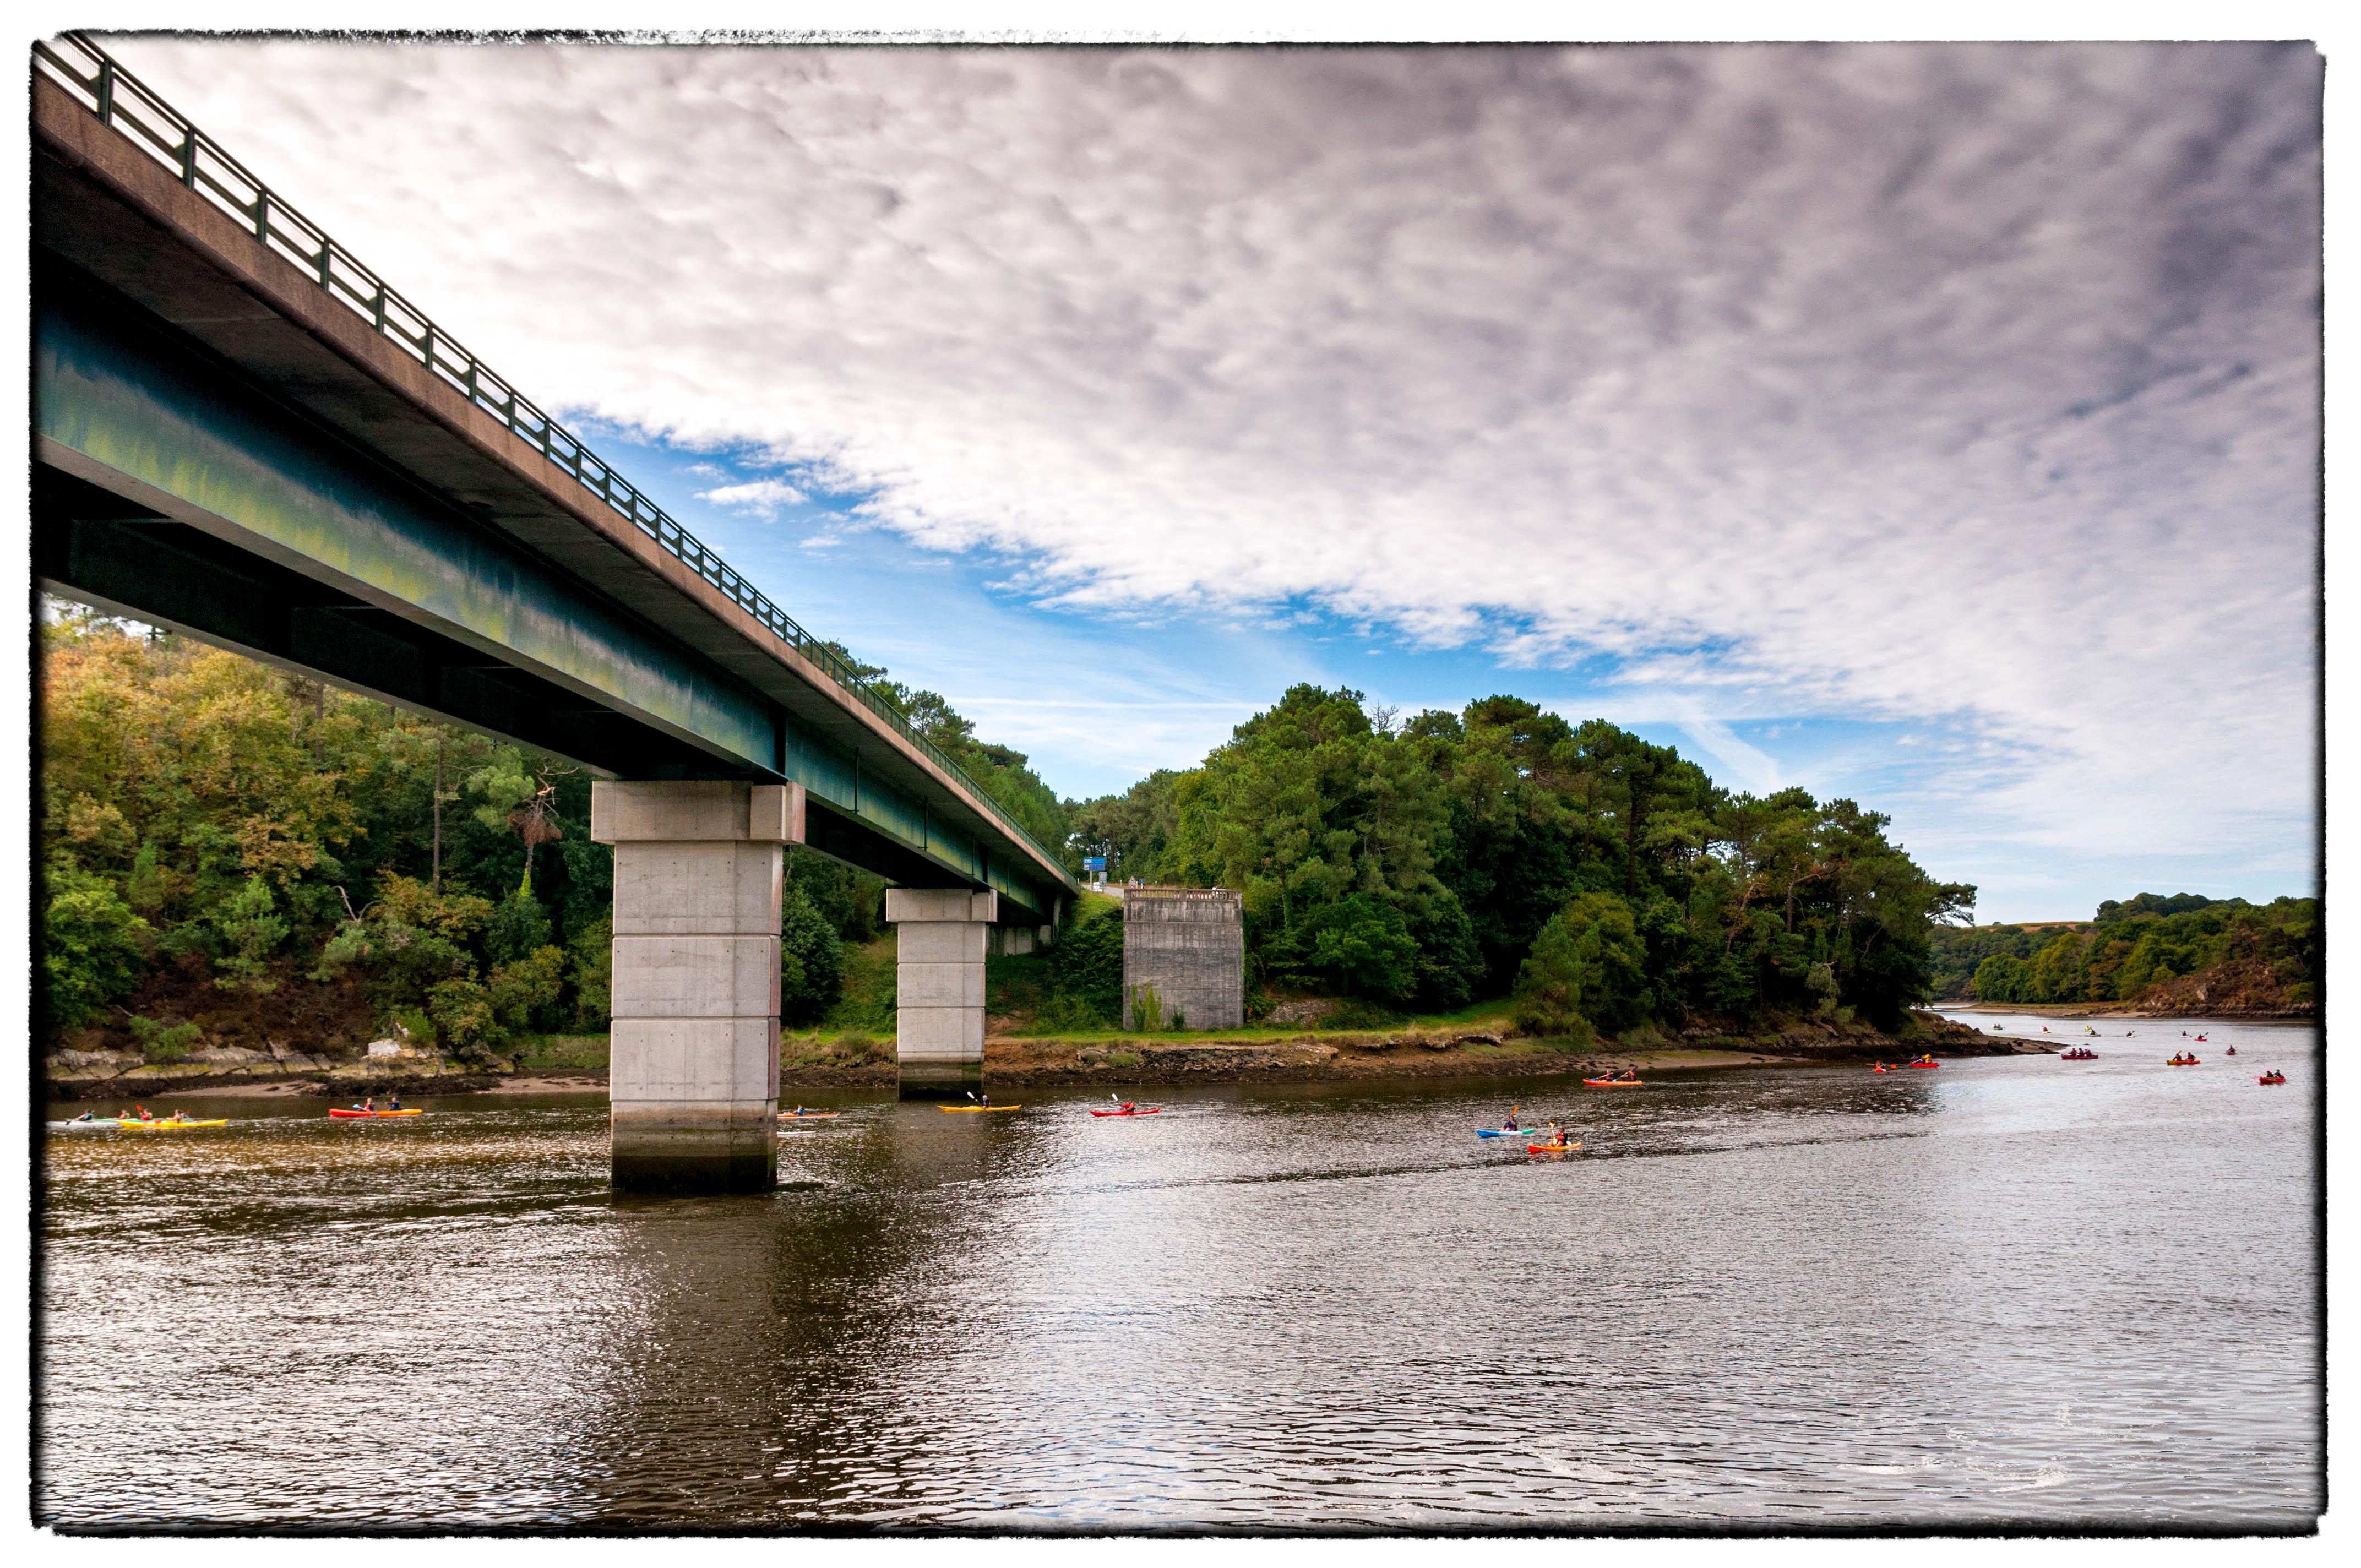 pont Saint maurice